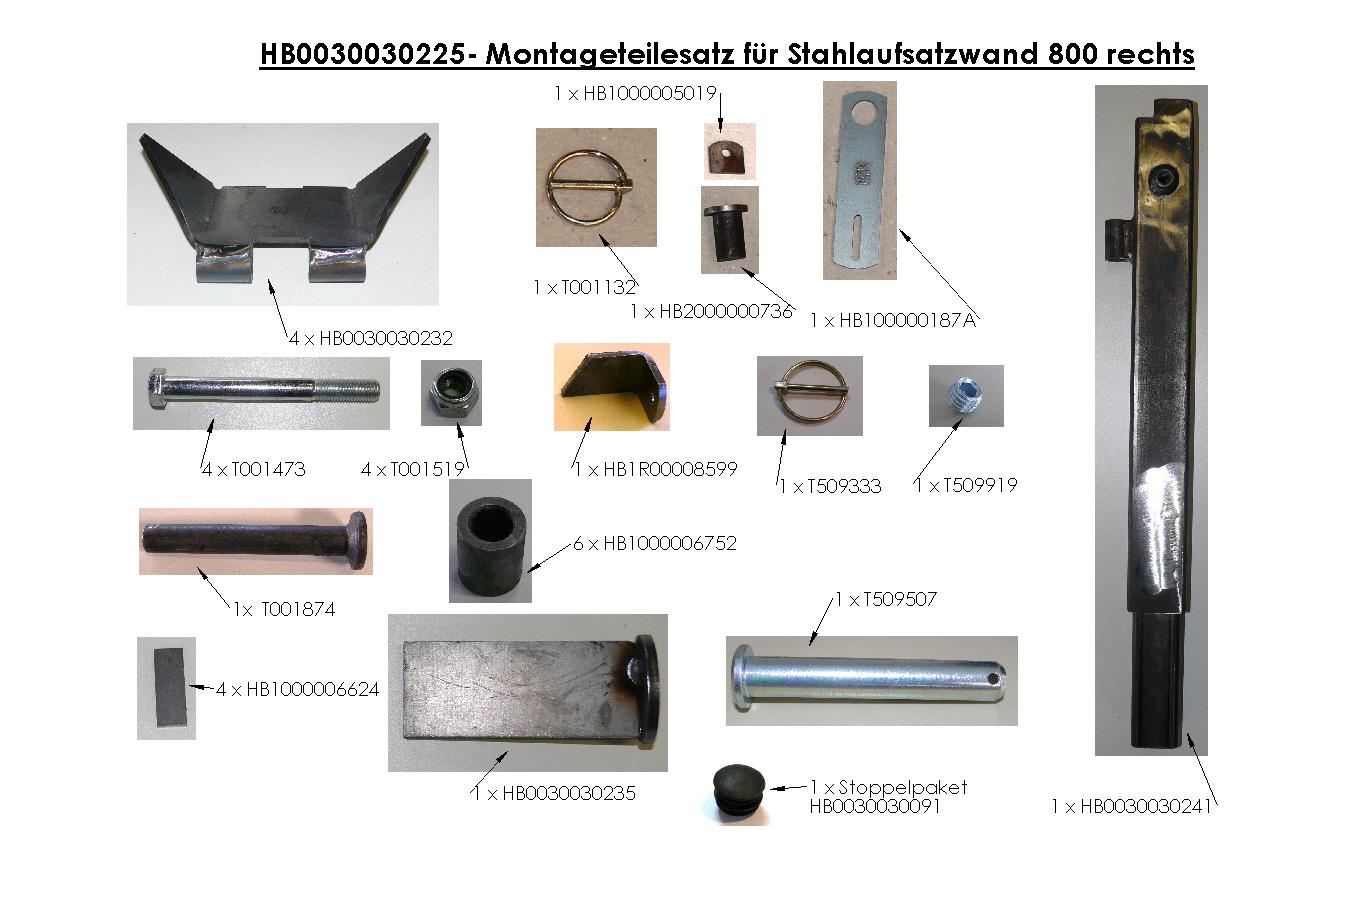 Brantner Kipper und Anhänger - assembly kit for steel attachment wall 800 right